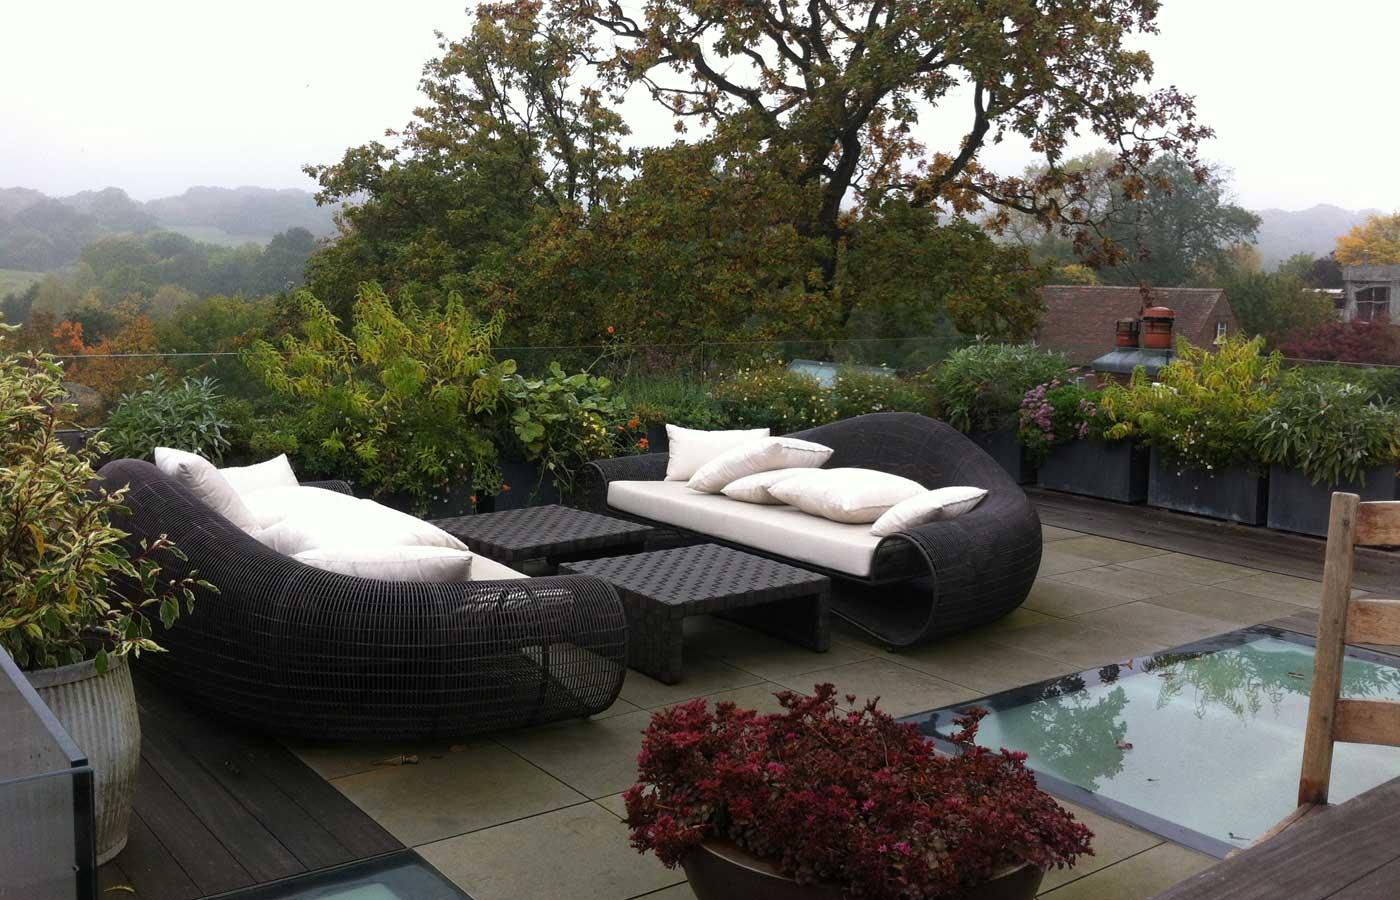 Diana milner garden design beautiful garden designs for Beautiful garden design ideas